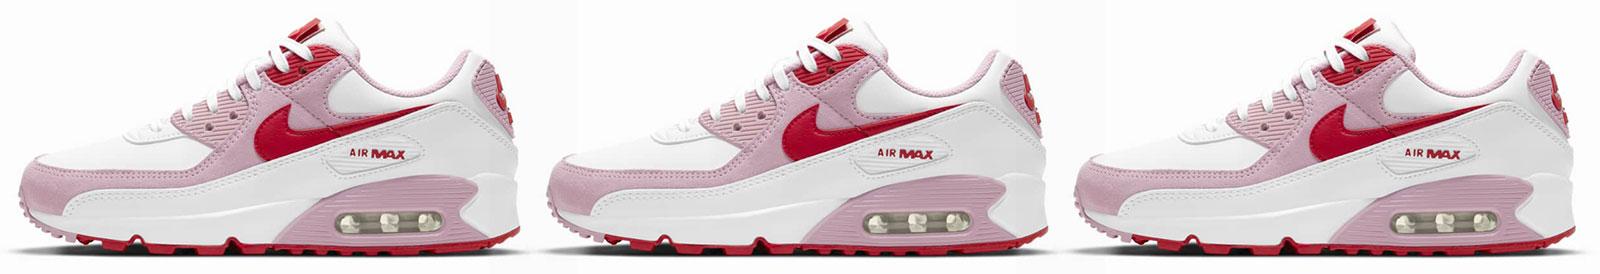 NikeLab DSM NYC